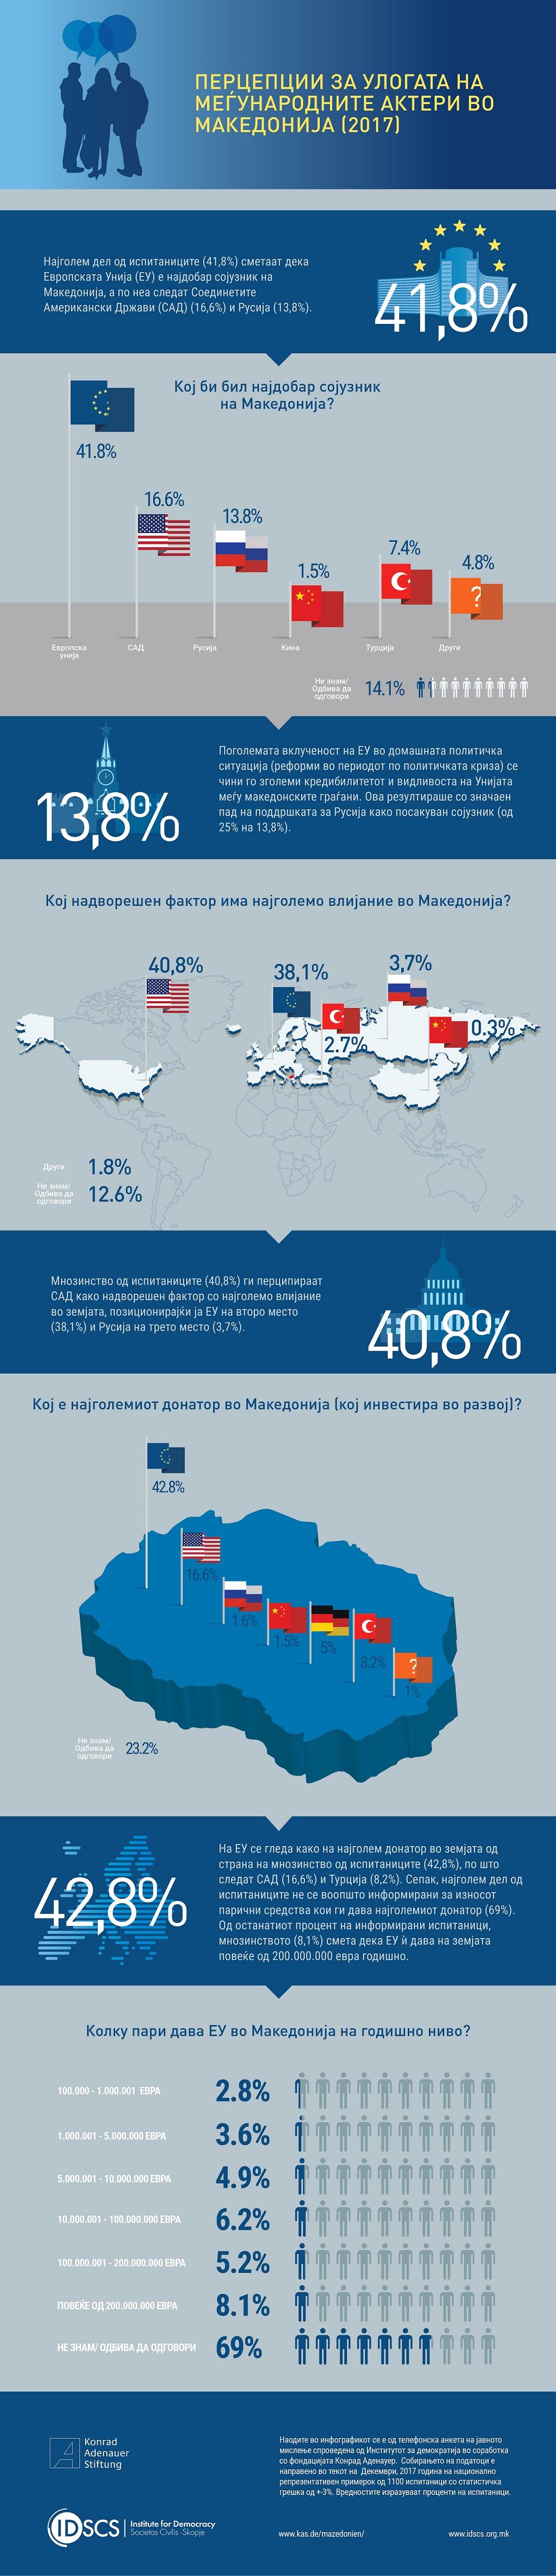 infografik-uloga-megjunarodni-akteri-2017